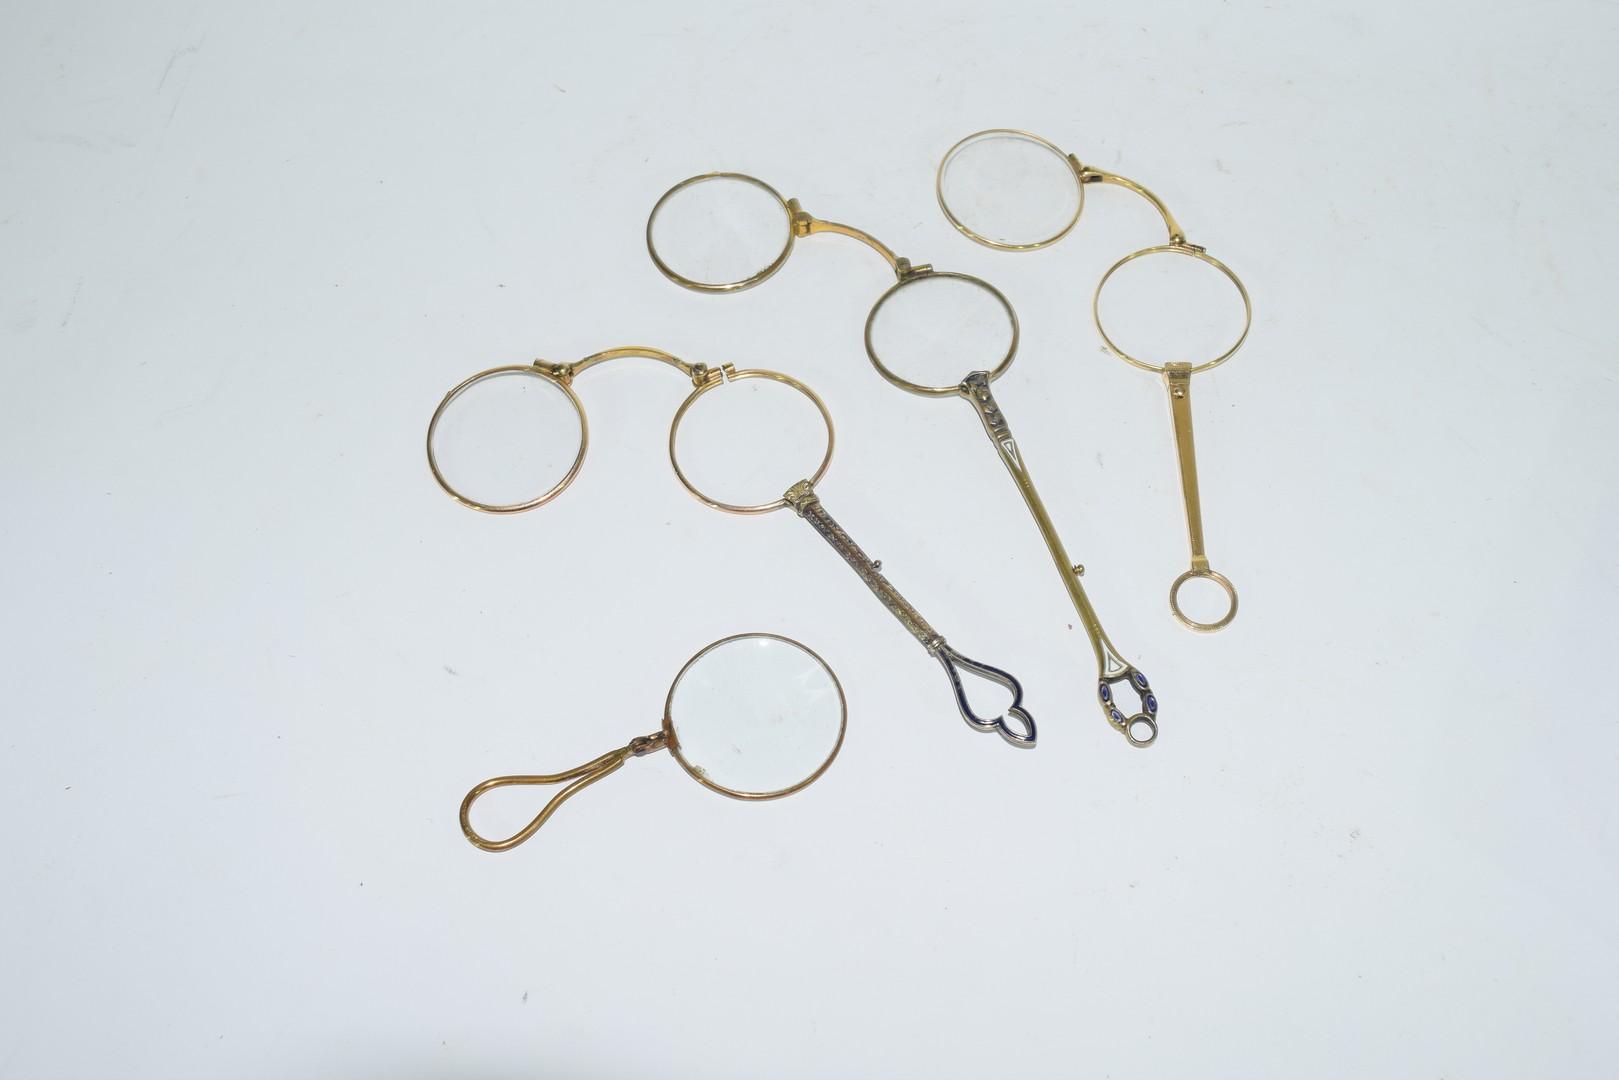 Quantity of 19th century spectacles